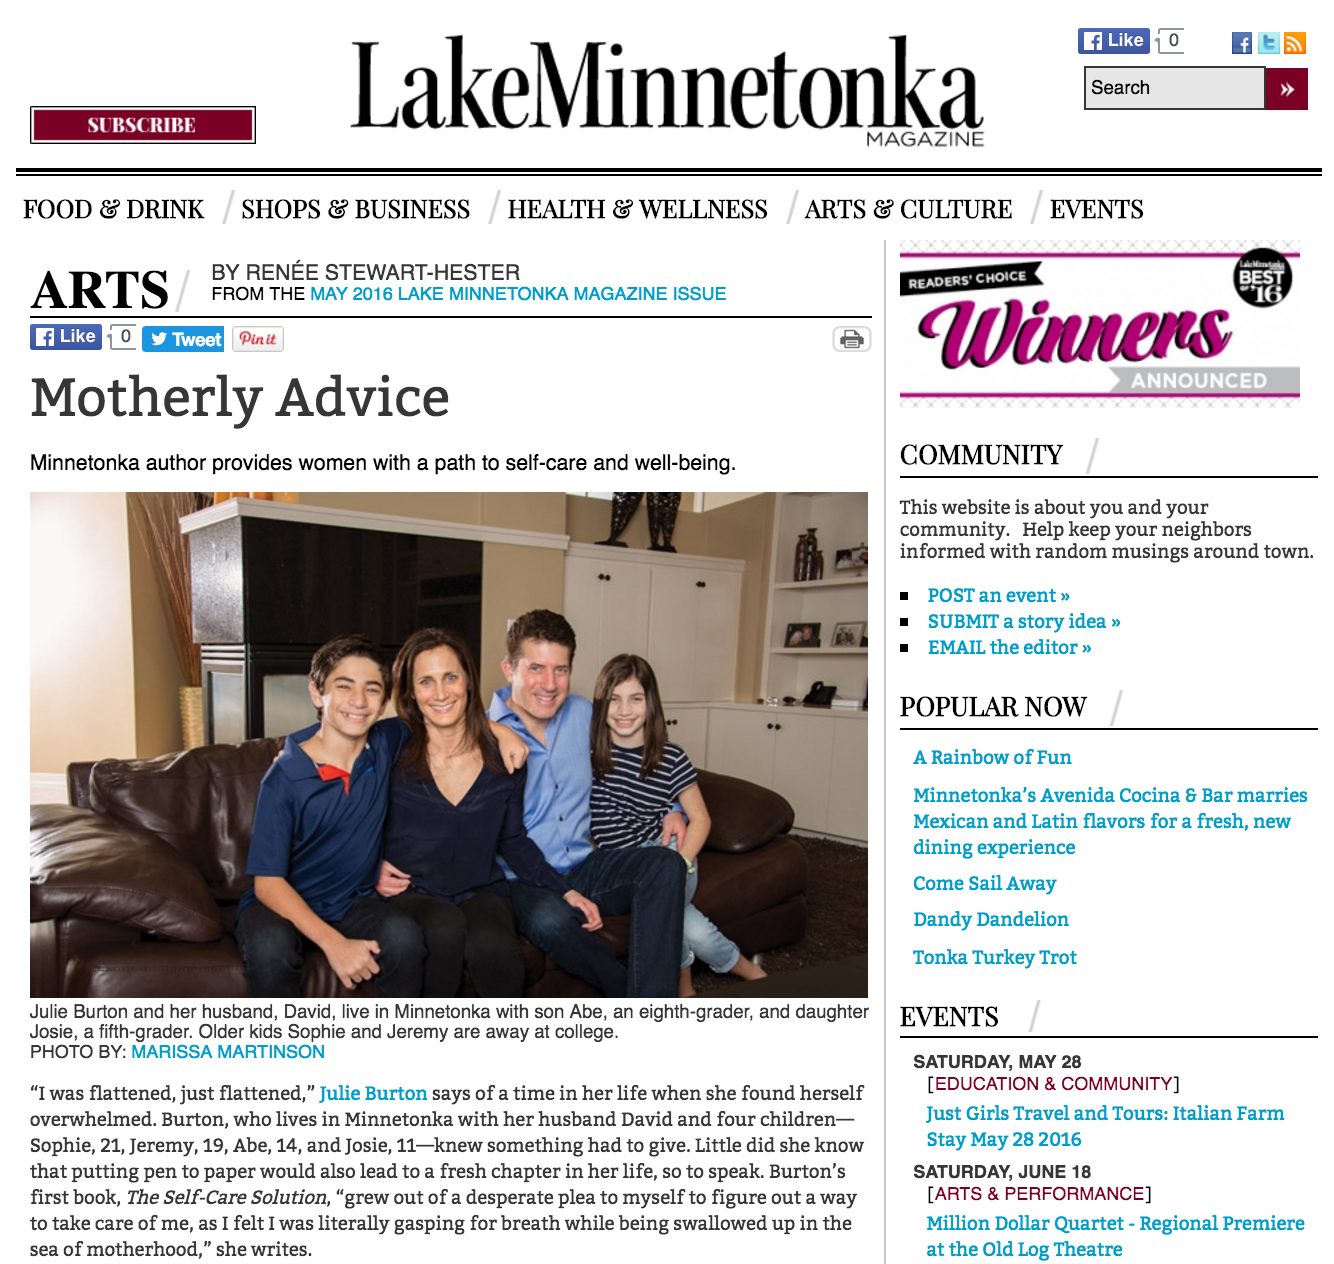 Lake-Minnetonka-Magazine-Julie-Burton-Self-Care-Solution